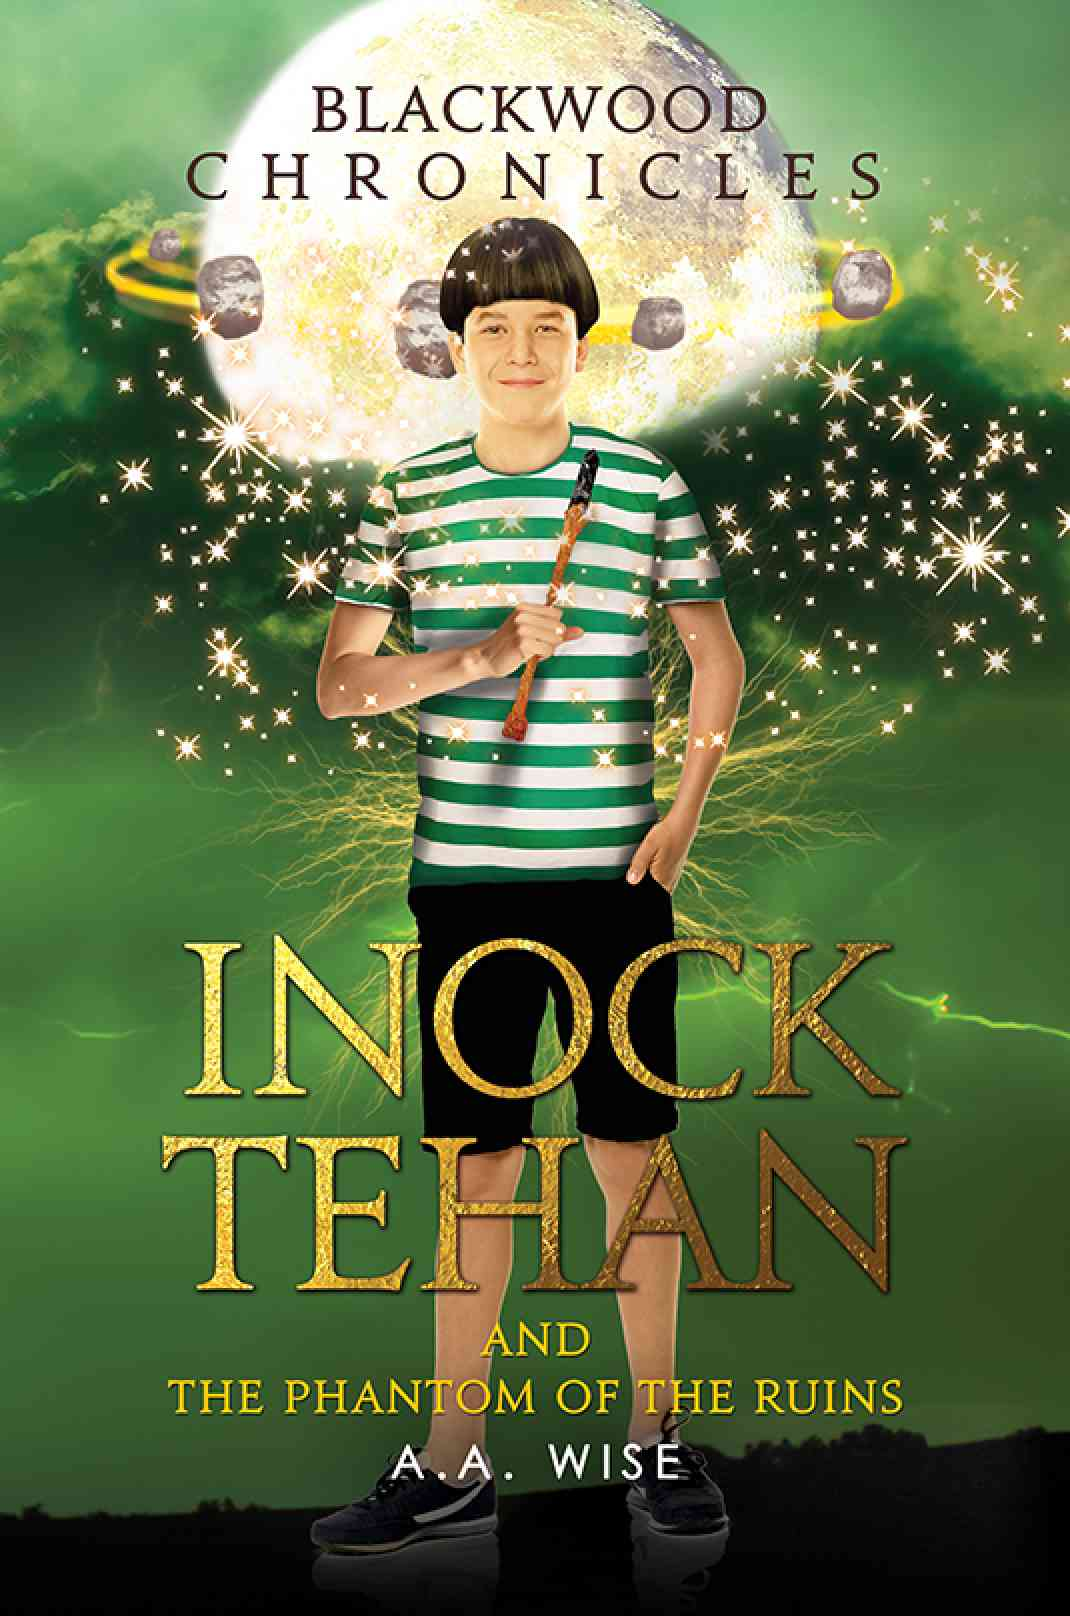 Blackwood Chronicles: Inock Tehan and the Phantom of the Ruins